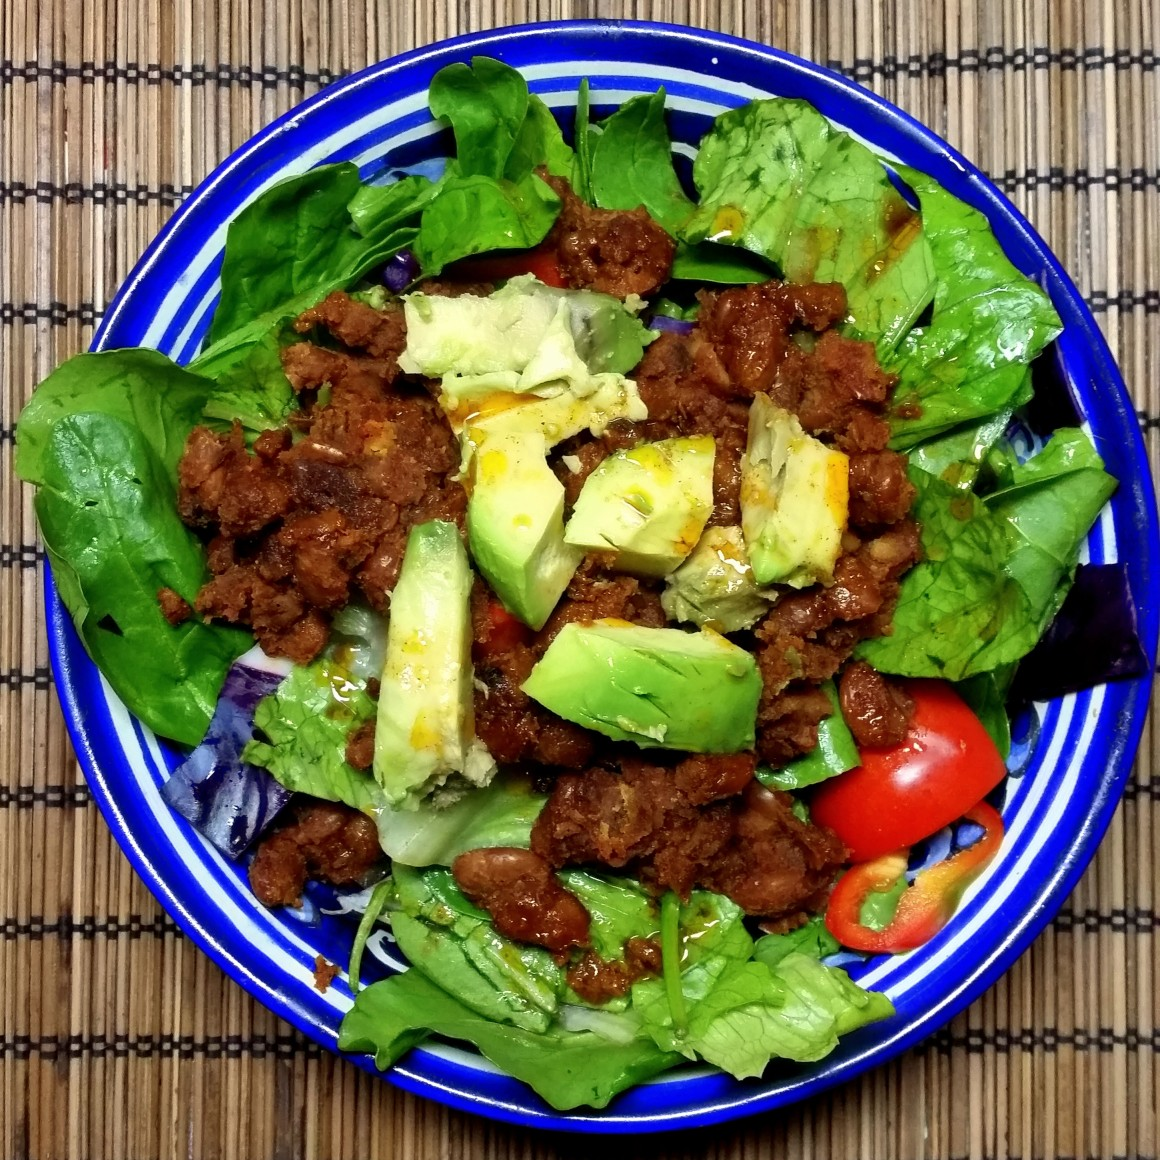 Salad photo 2-mdp